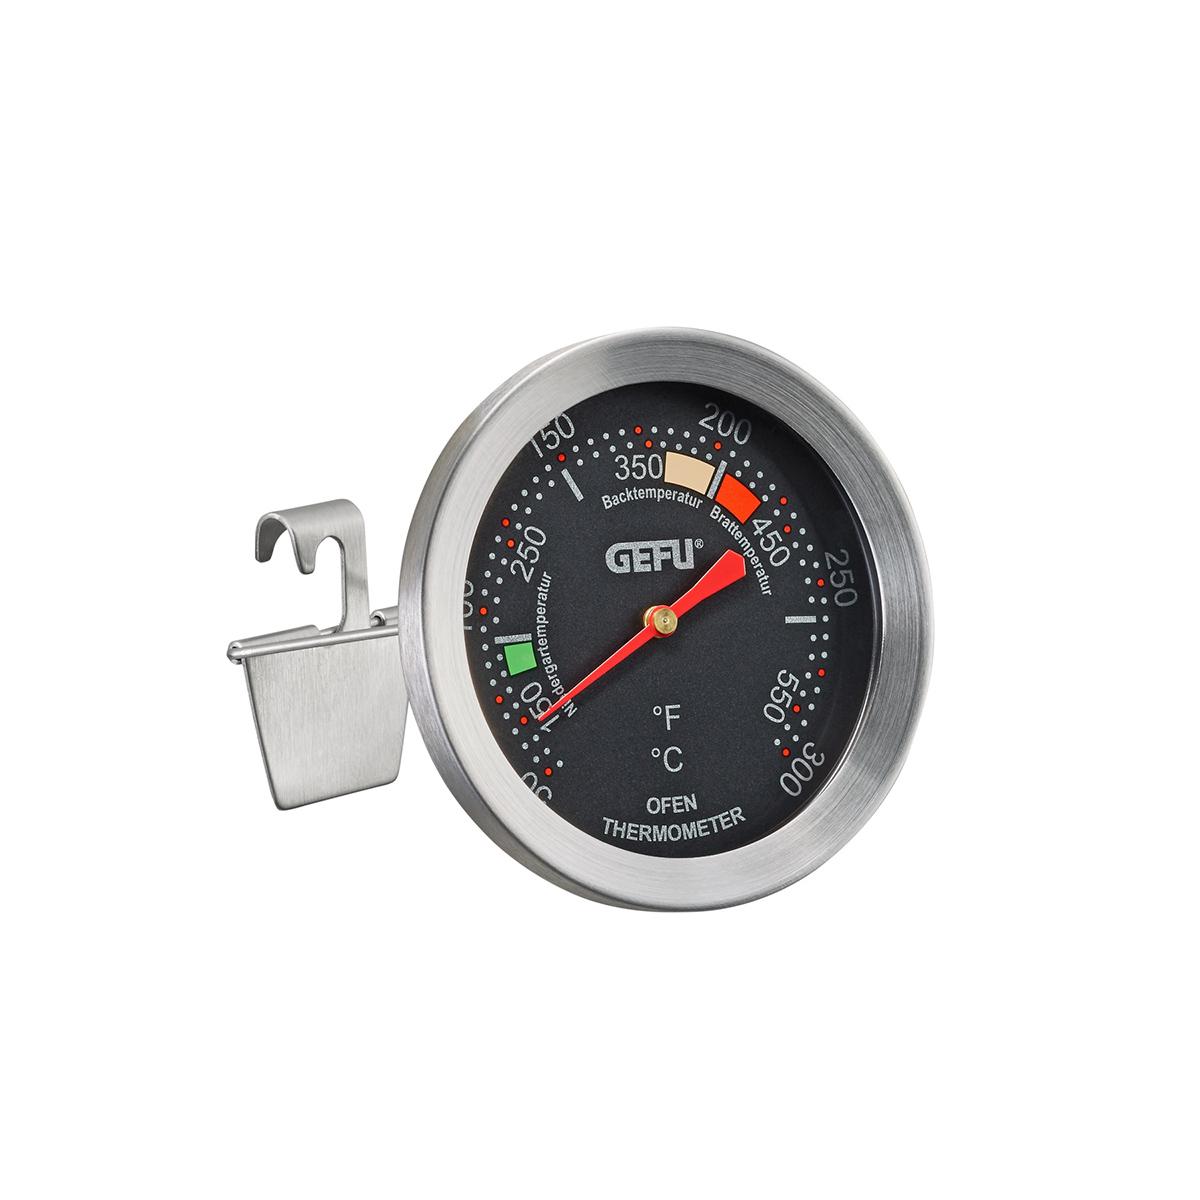 GEFU - 'Backofenthermometer MESSIMO - Braten / BBQ'